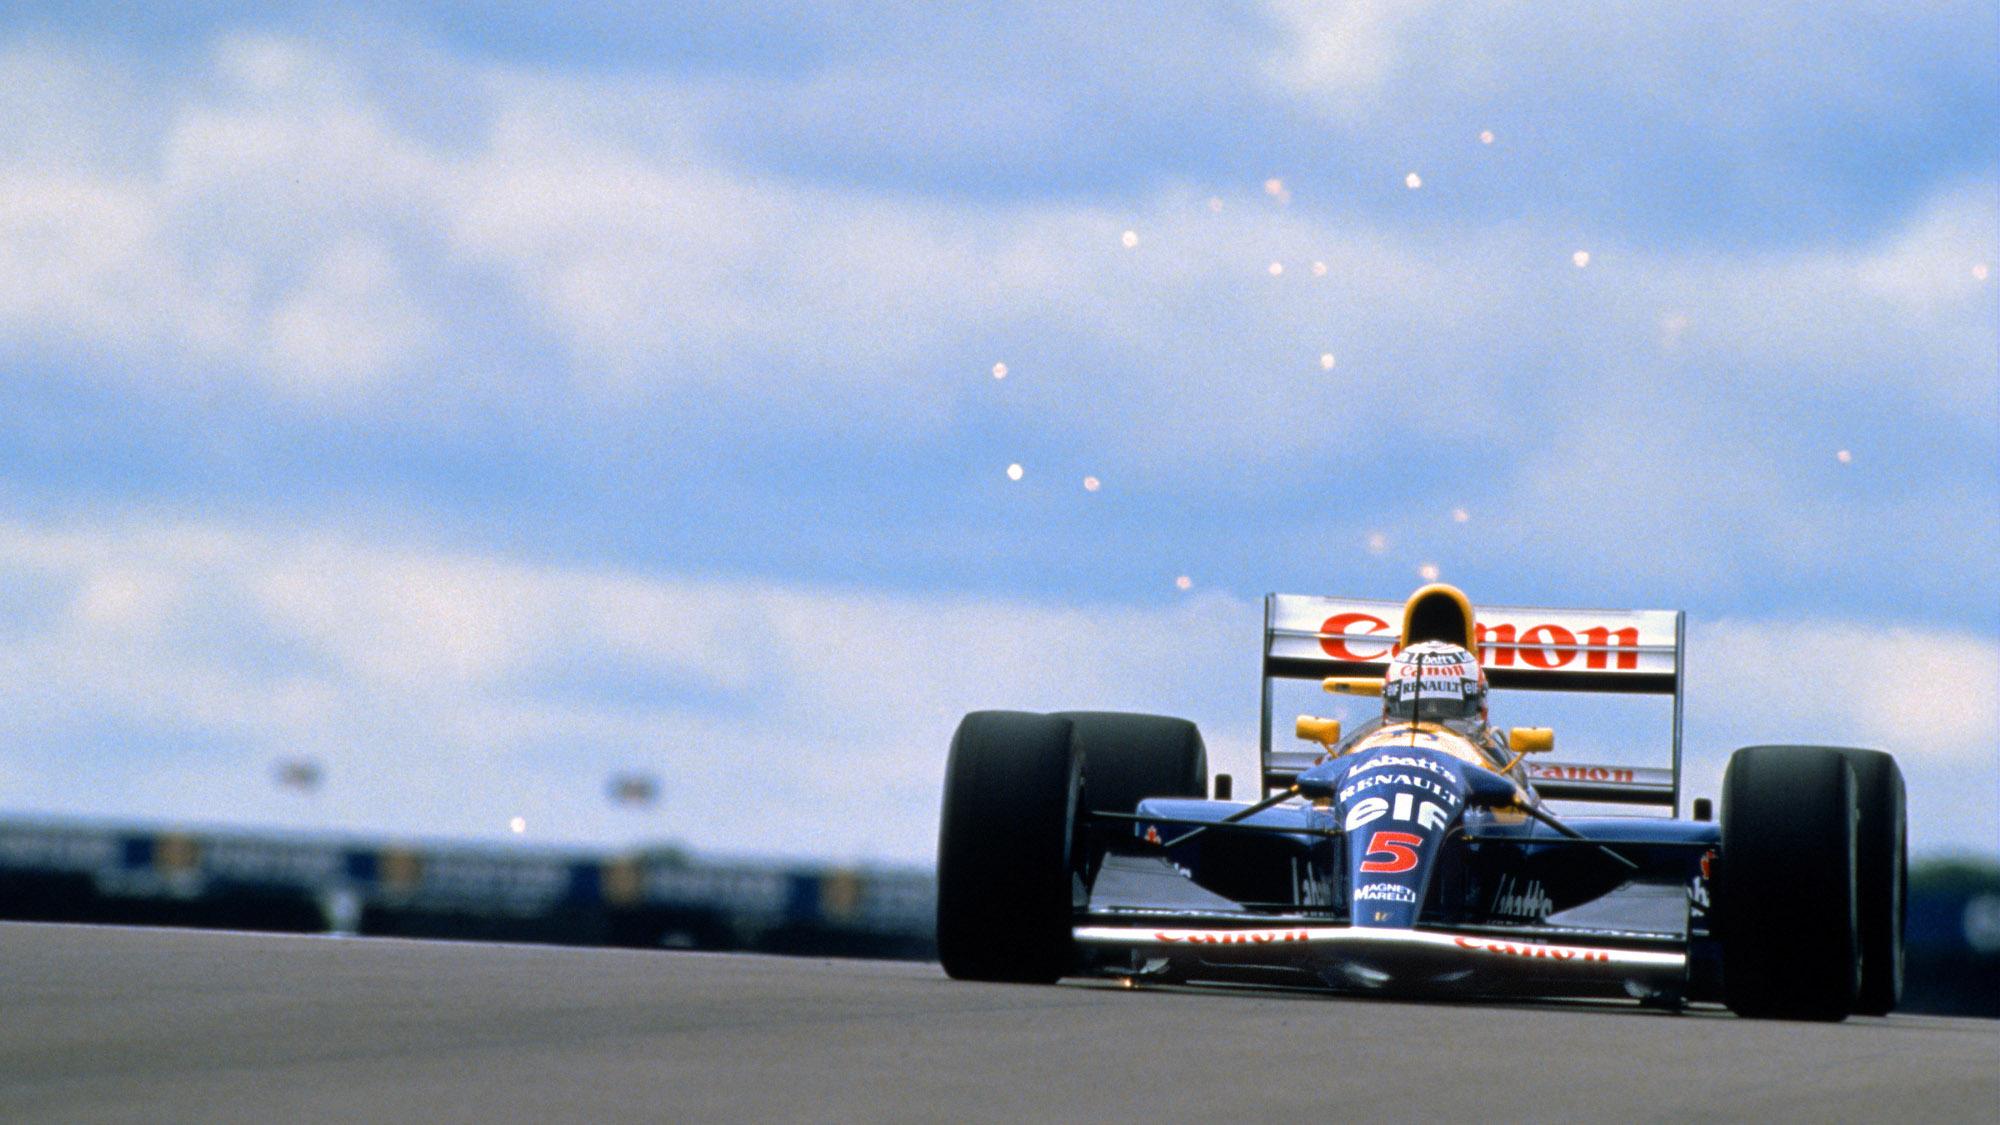 1992 Williams of Nigel Mansell